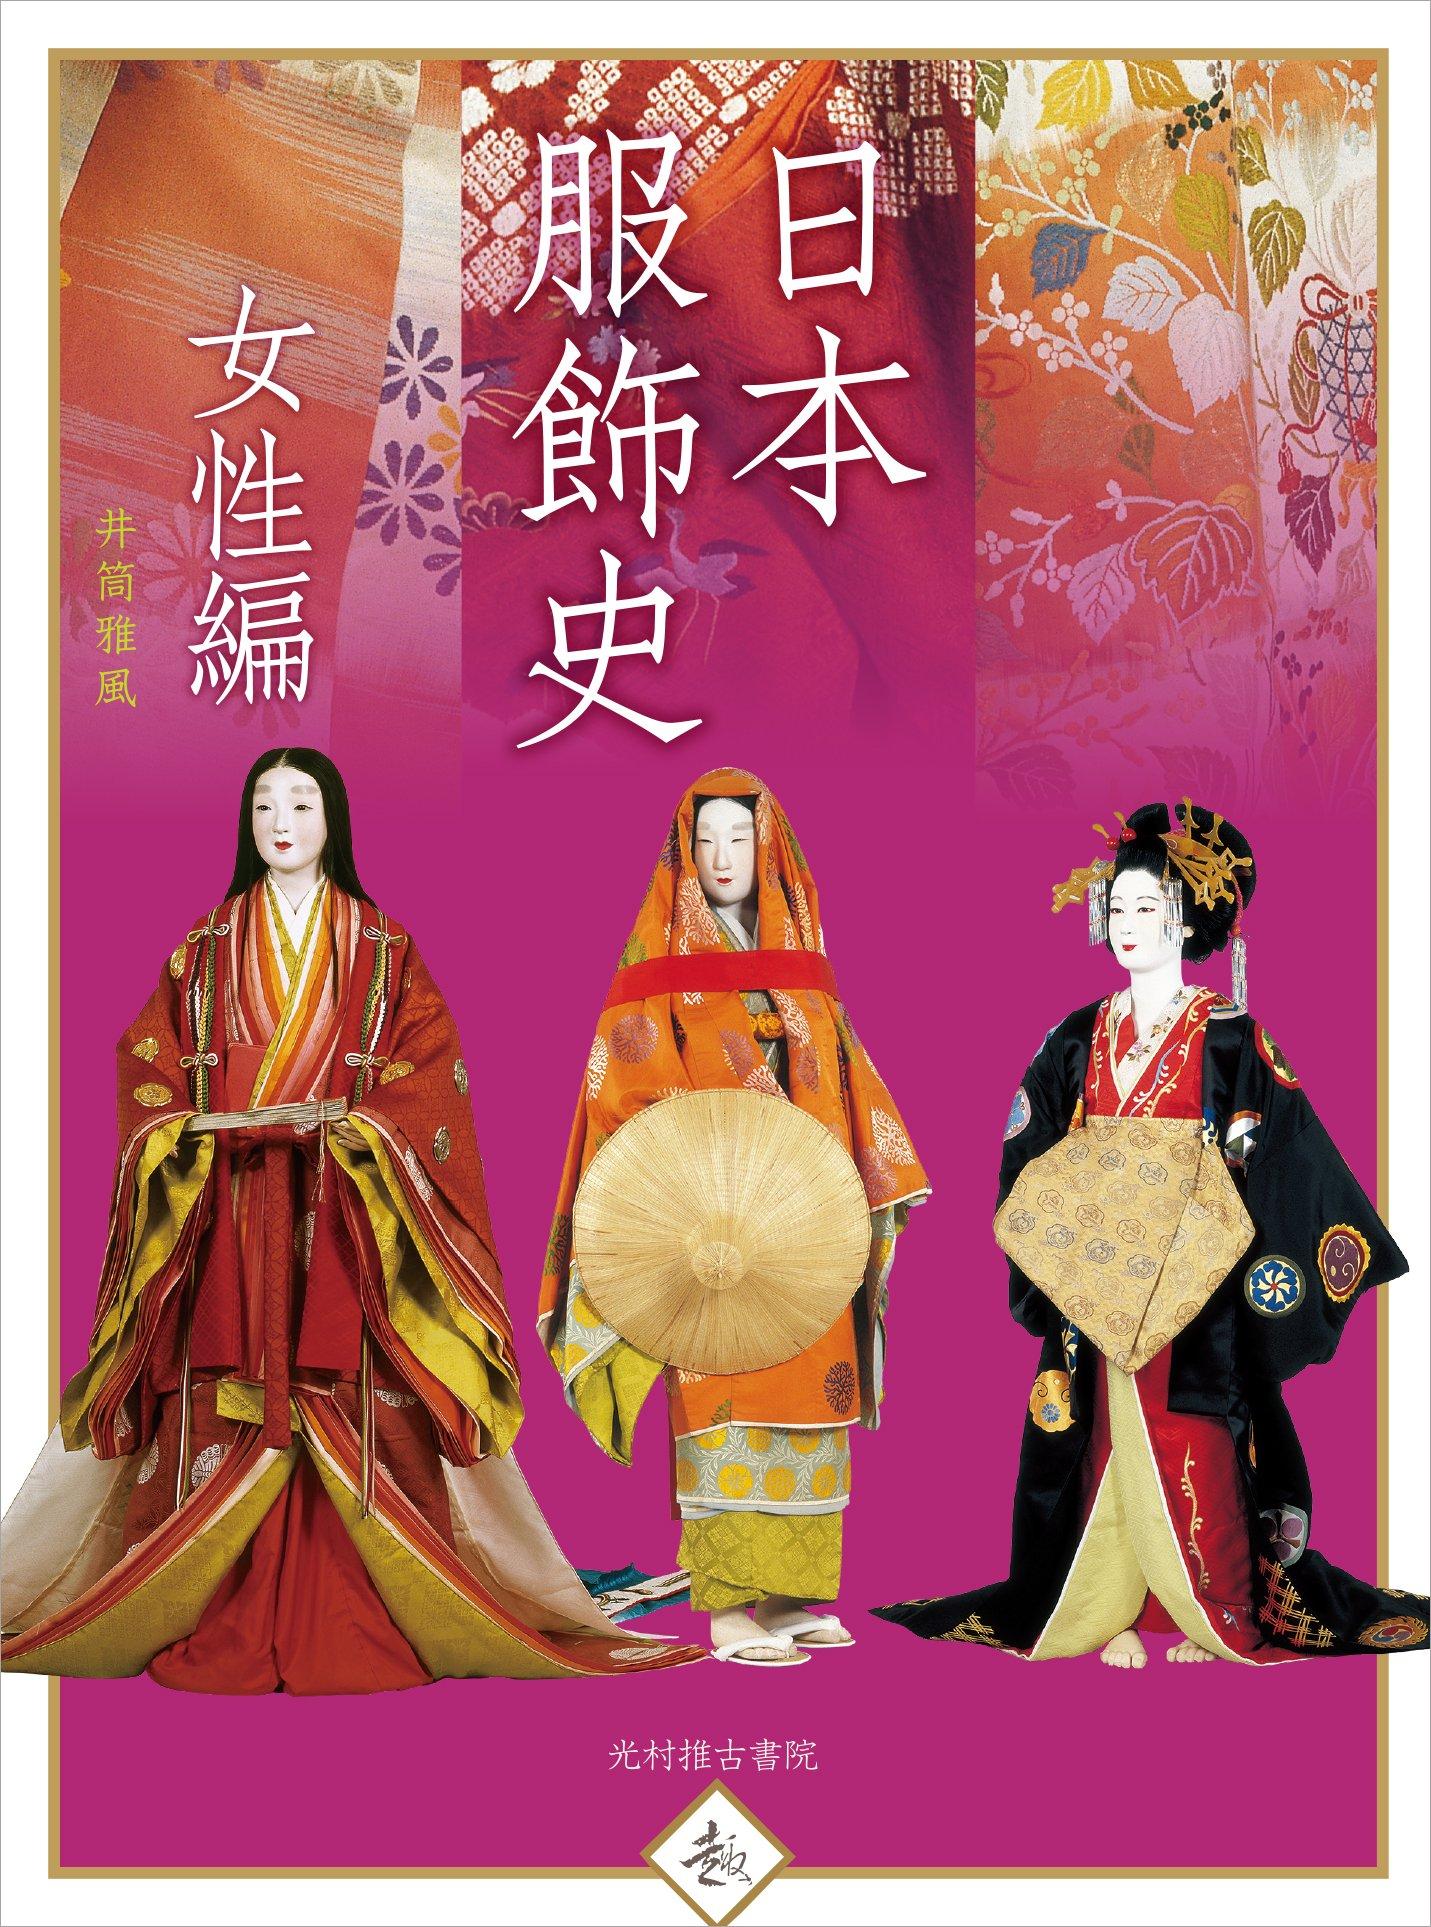 13539a3d9 日本服飾史 女性編 (趣): 9784838105243: Amazon.com: Books